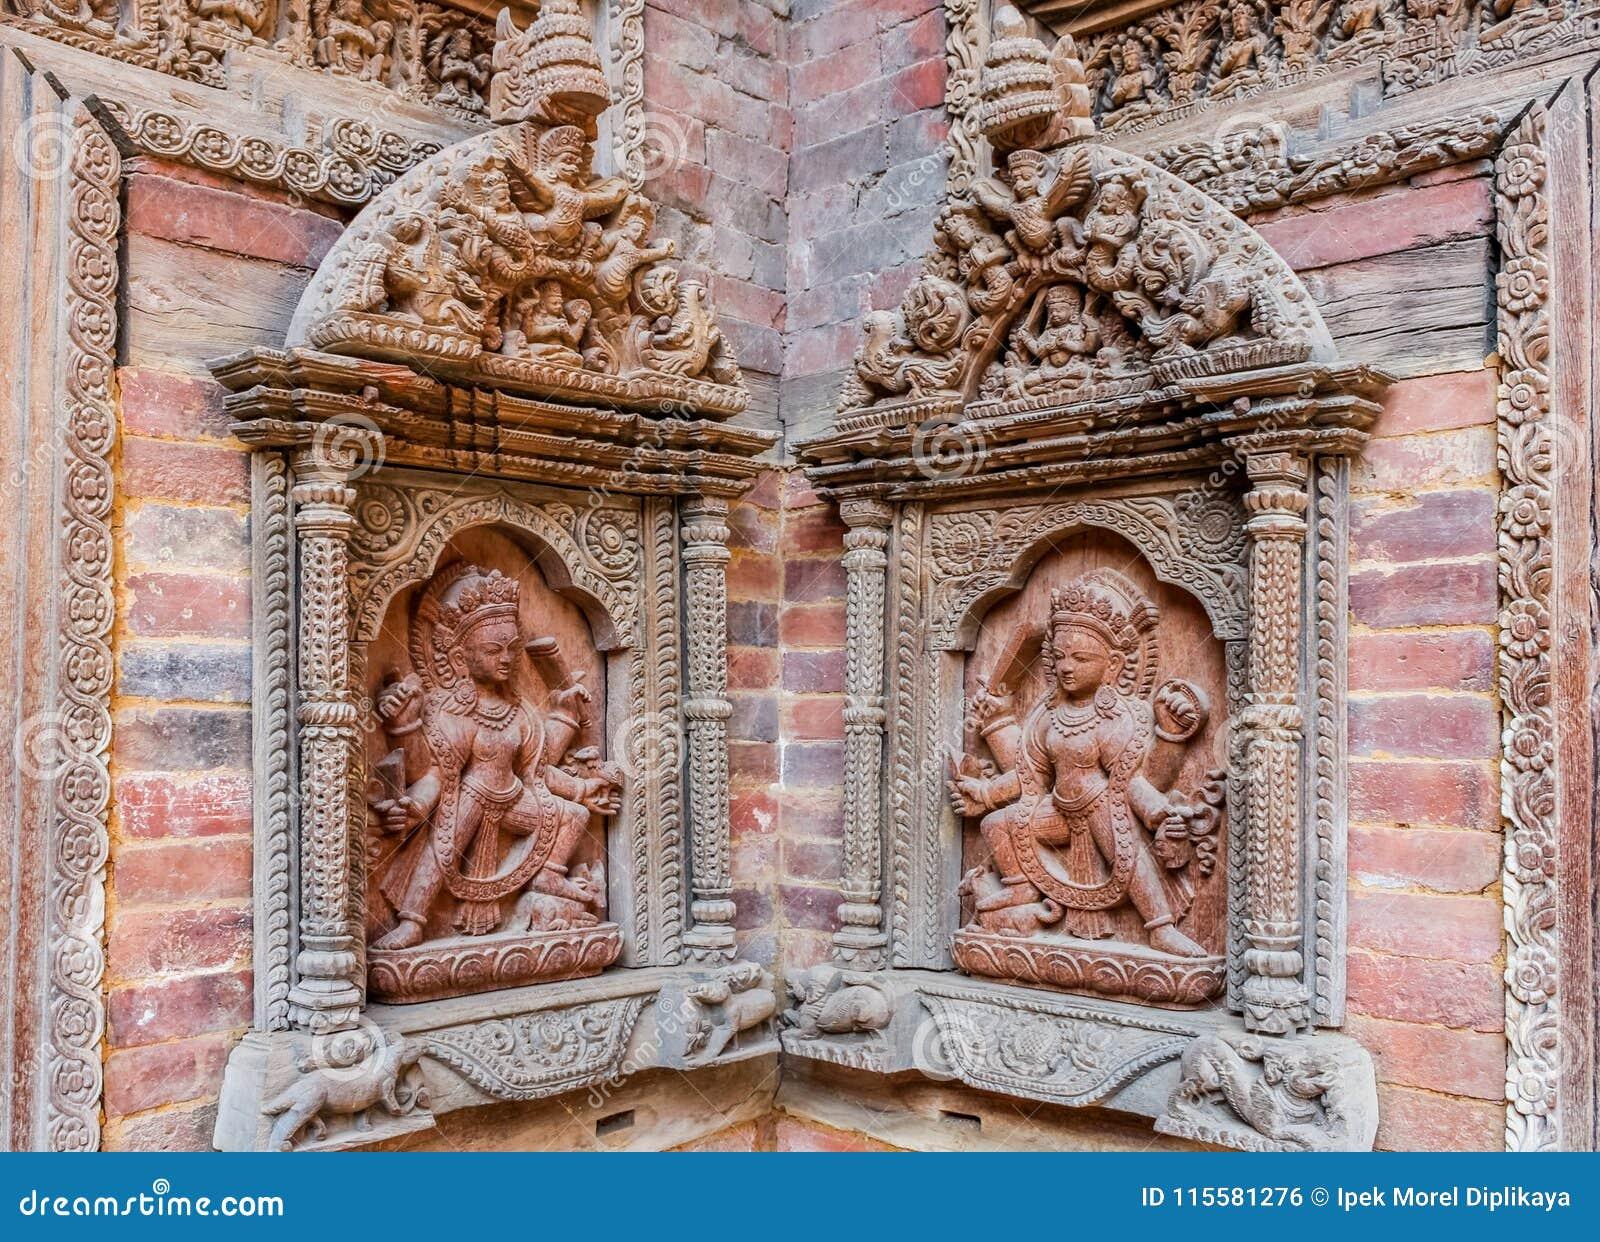 Geschnitzte Statuen auf Hofwand Mul Chowk, Hanuman Dhoka Royal Palace, Quadrat Patan Durbar, Lalitpur, Nepal